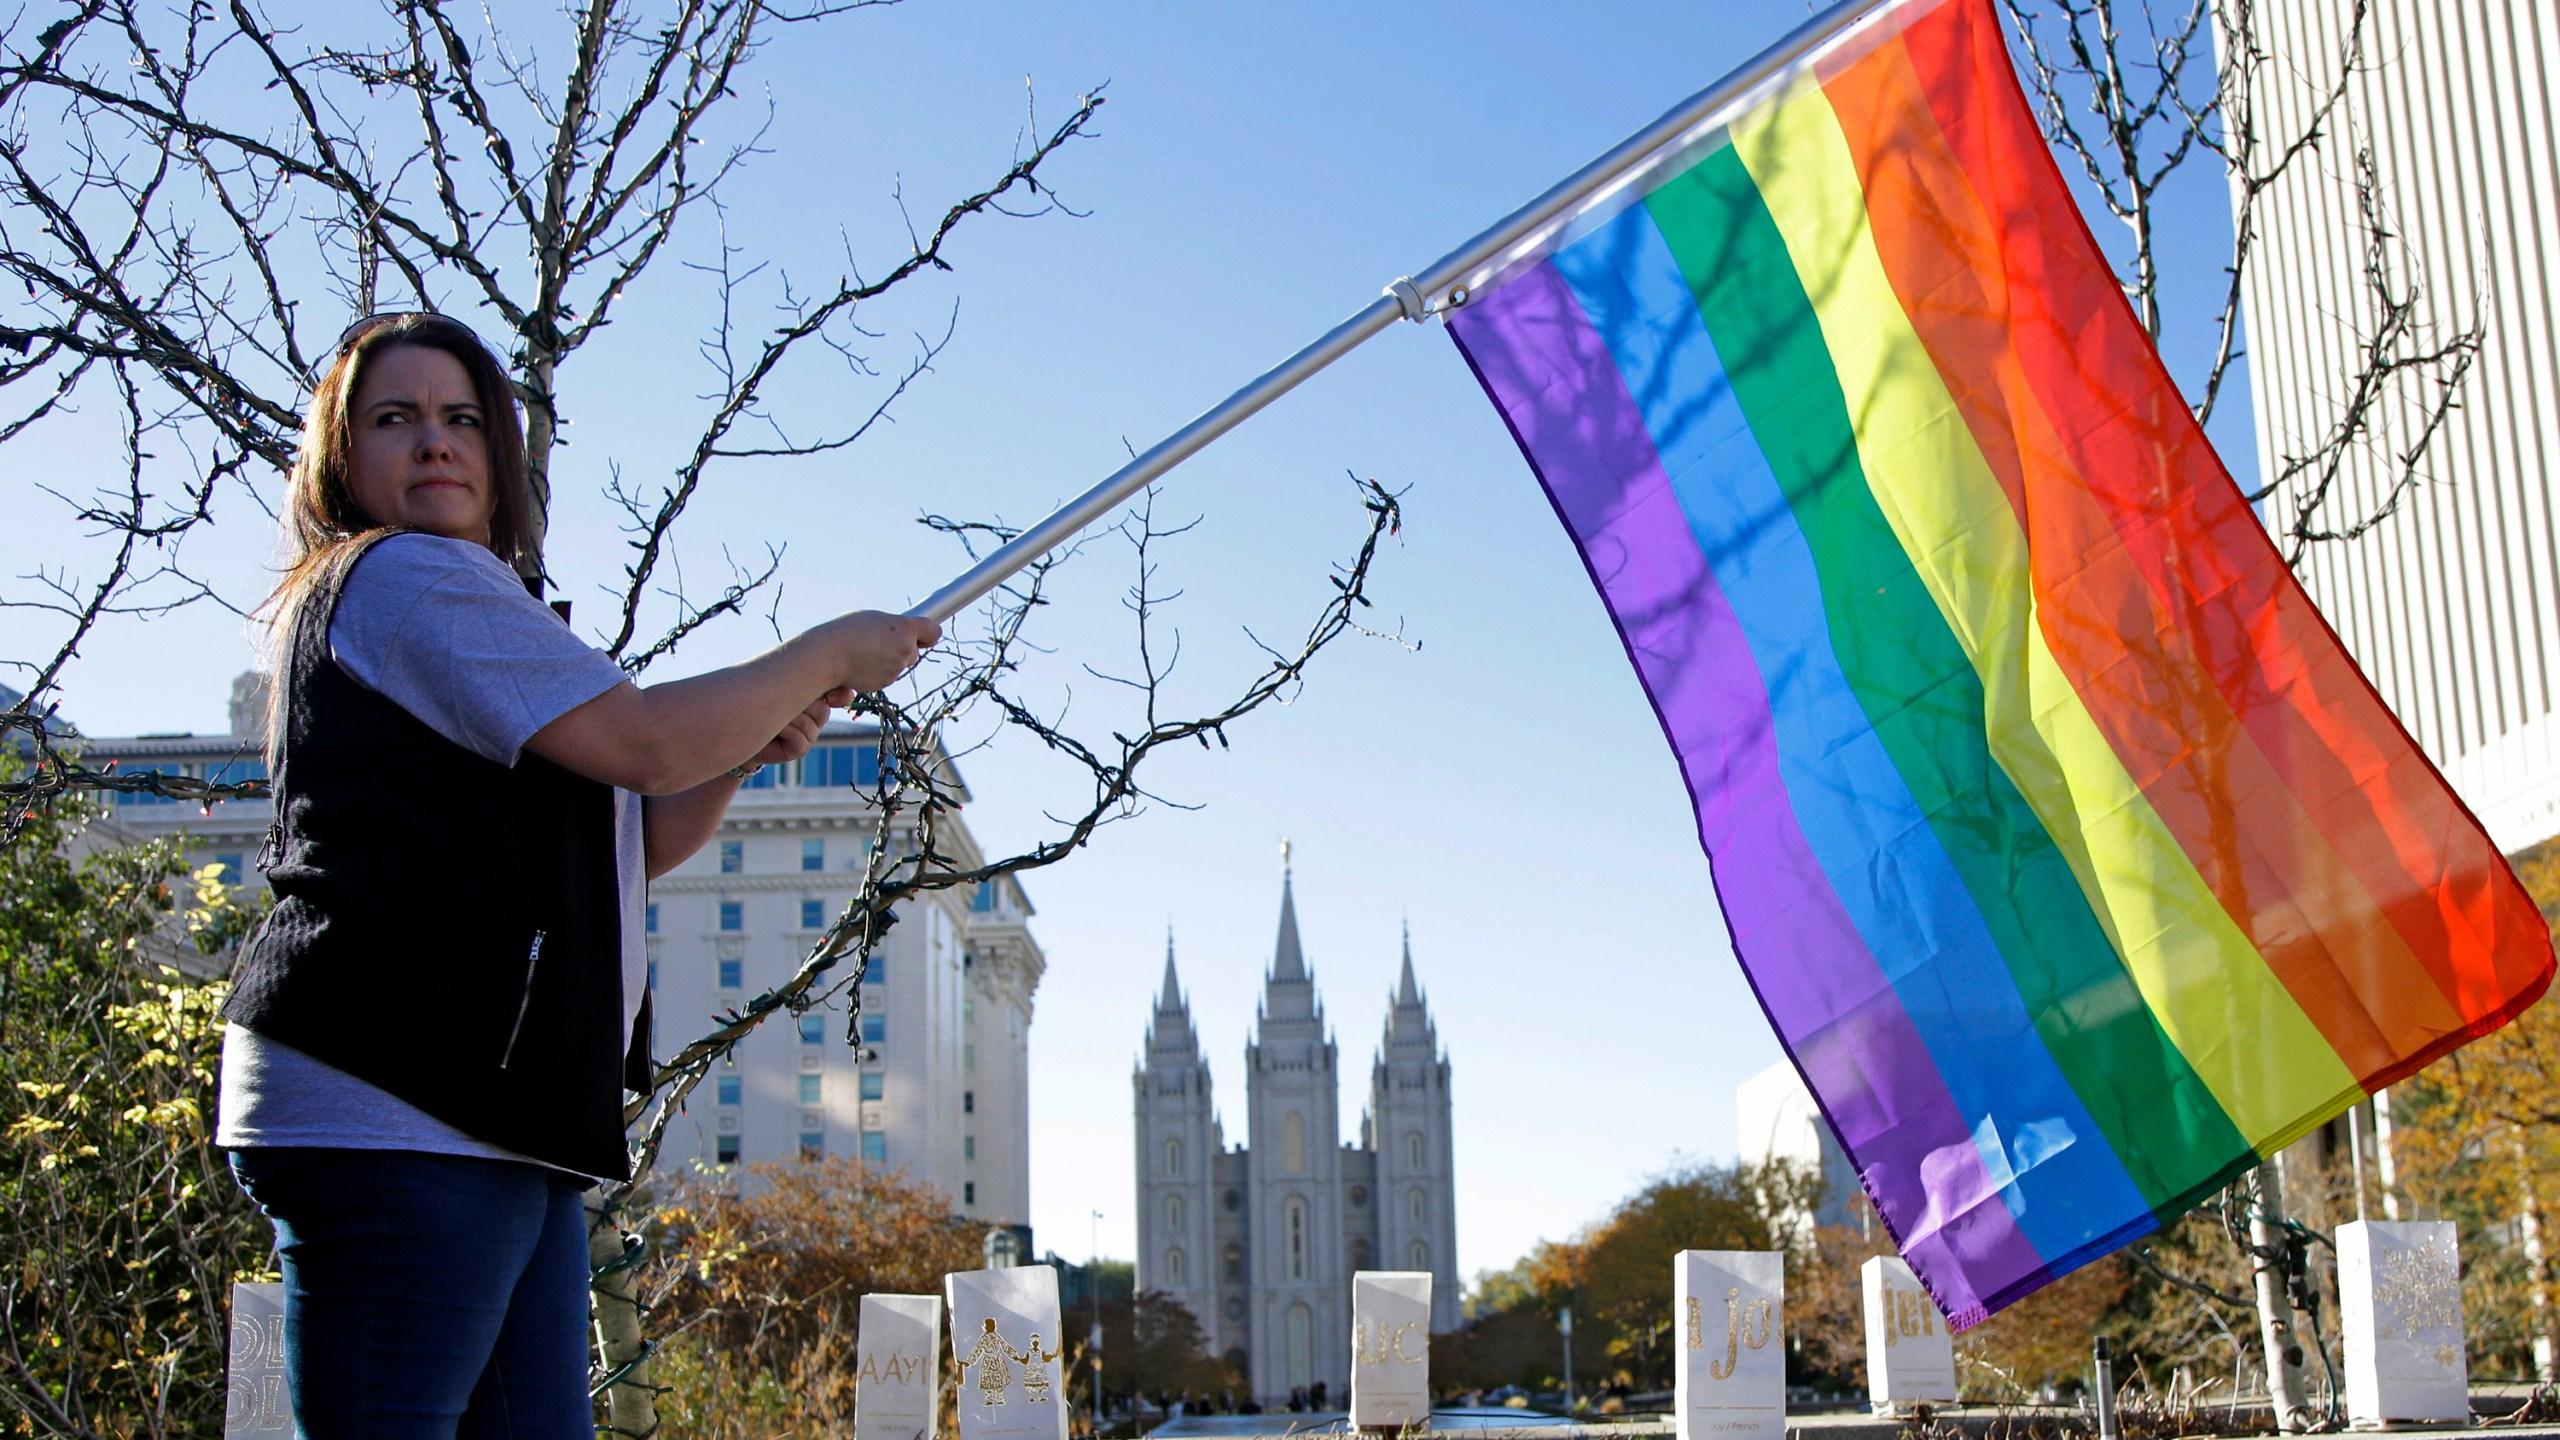 Mormons_LGBTQ_15614-159532.jpg35547117